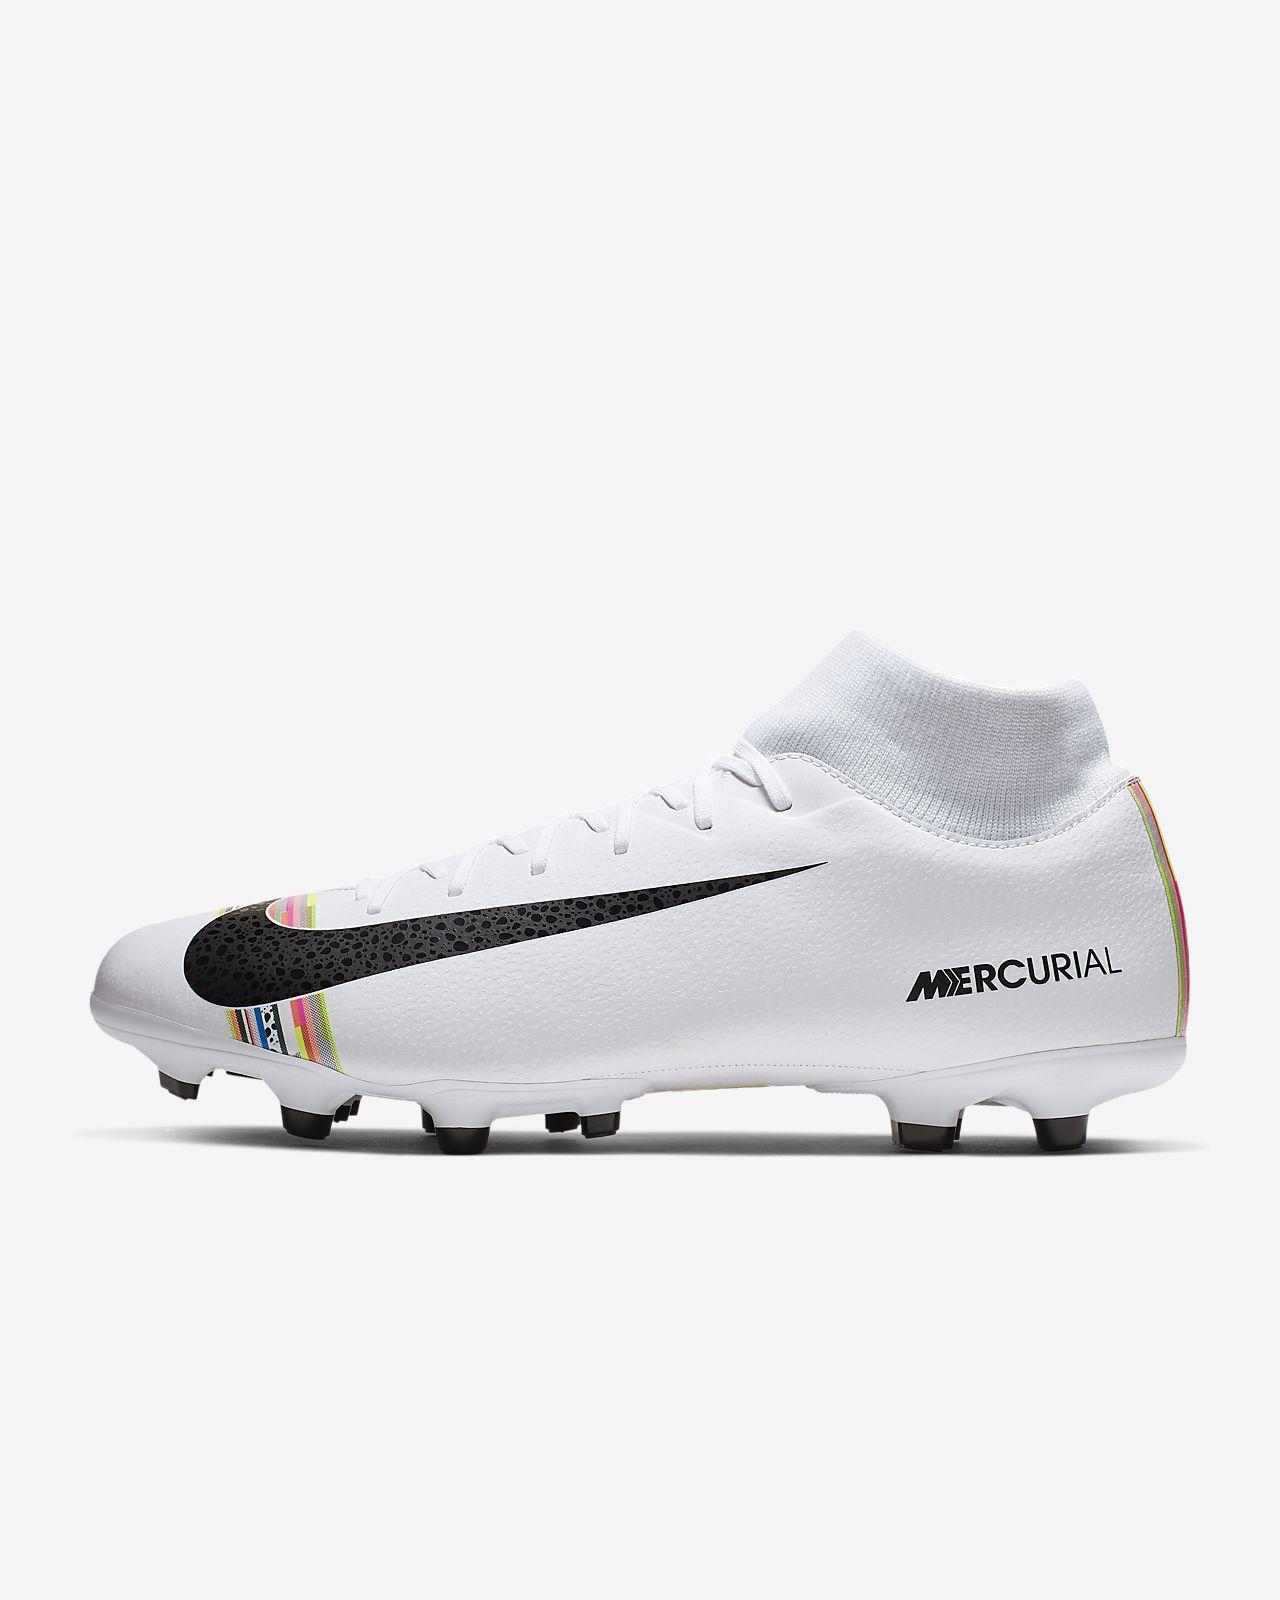 cfbafe3568f0ee ... Scarpa da calcio multiterreno Nike Mercurial Superfly 6 Academy LVL UP  MG